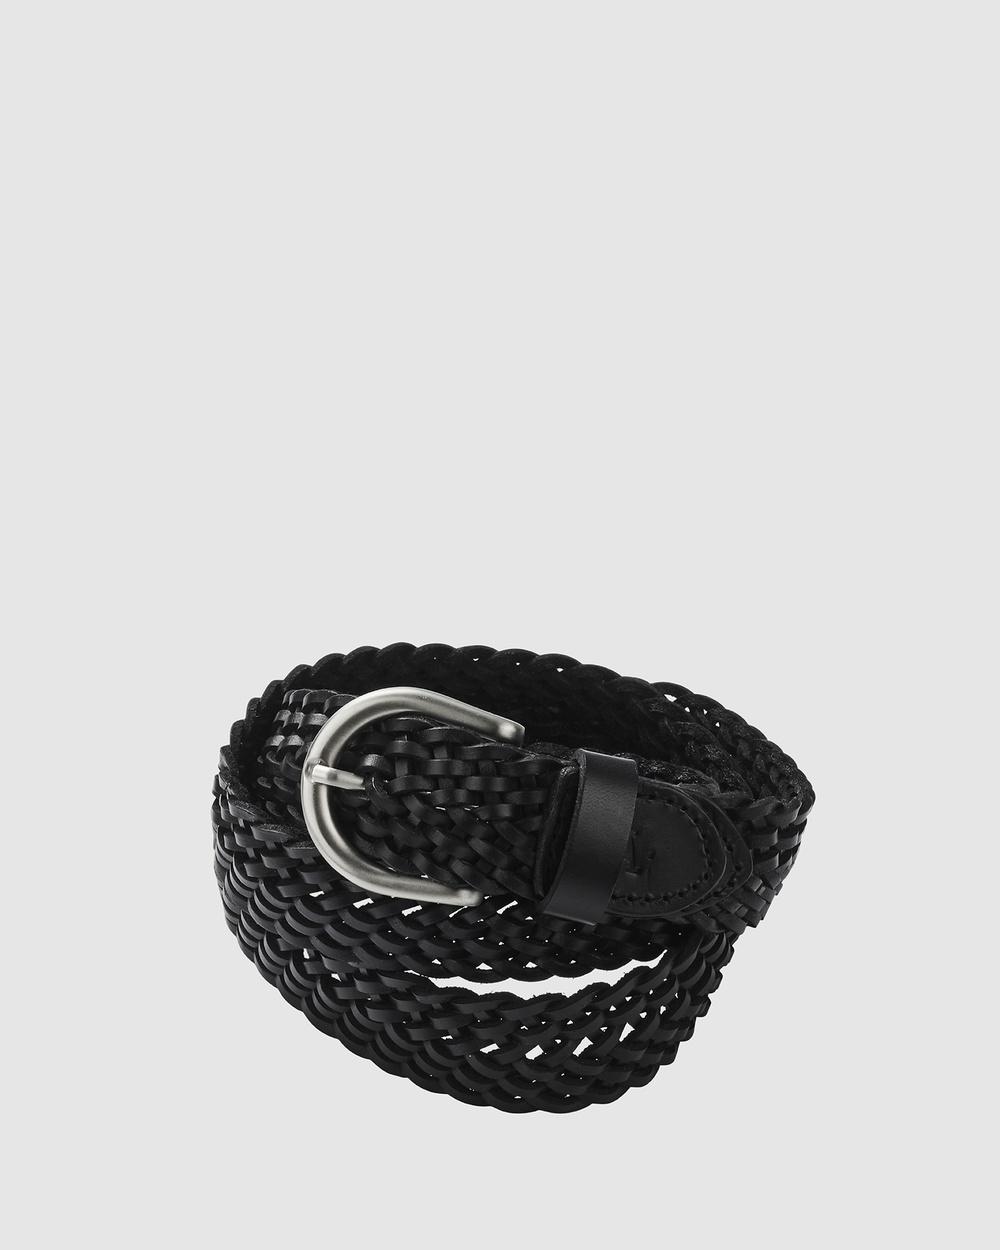 Atlas Lifestyle Co Belt 02 Belts Black